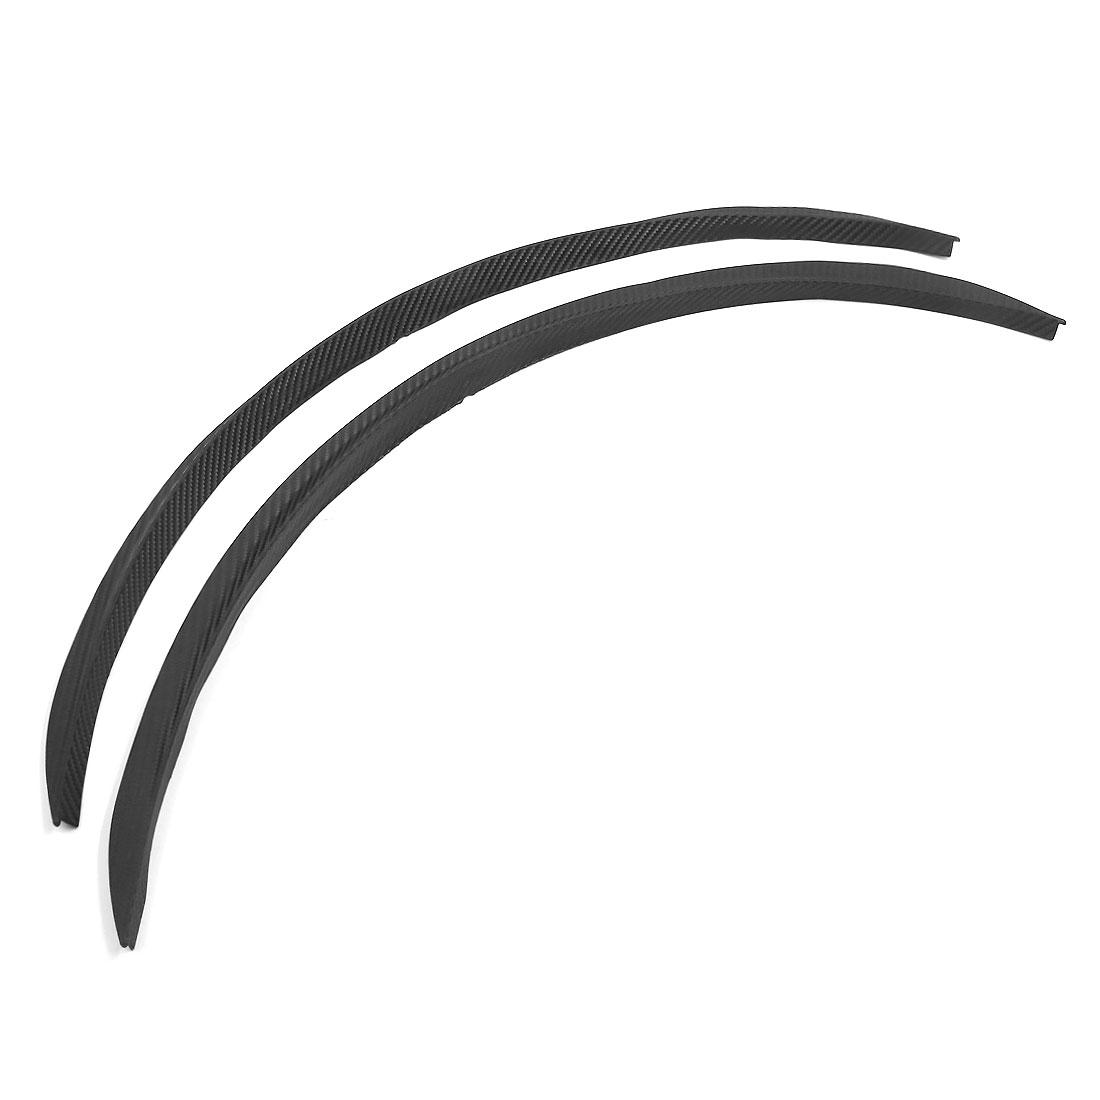 2PCS Car Black Carbon Fiber Printed Plastic Wheel Trim Strip 60cm Long